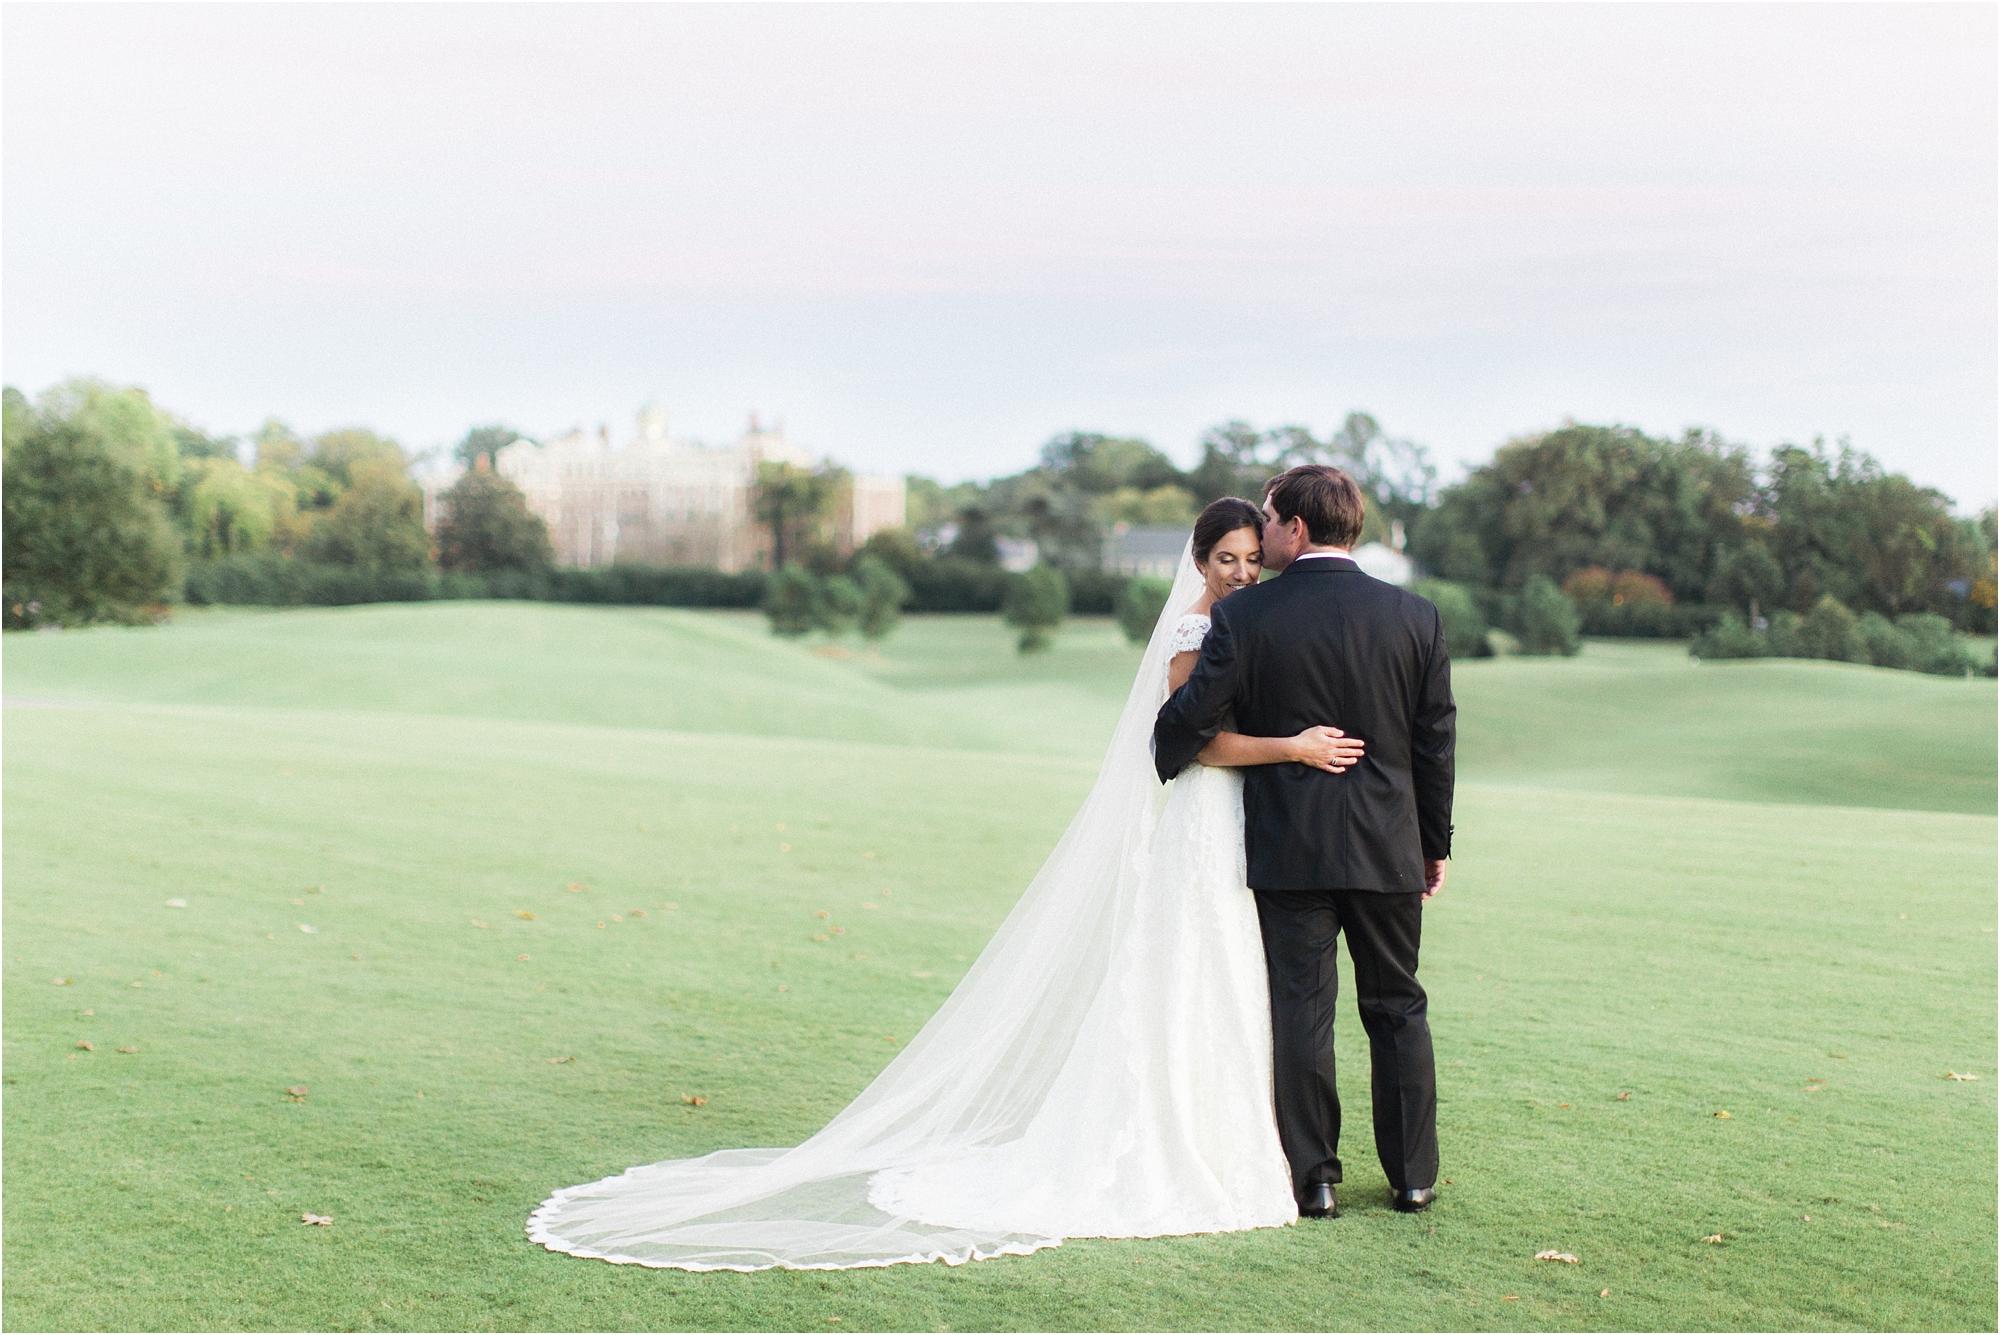 stephanie-yonce-photography-richmond-virginia-country-club-wedding-photo_032.JPG